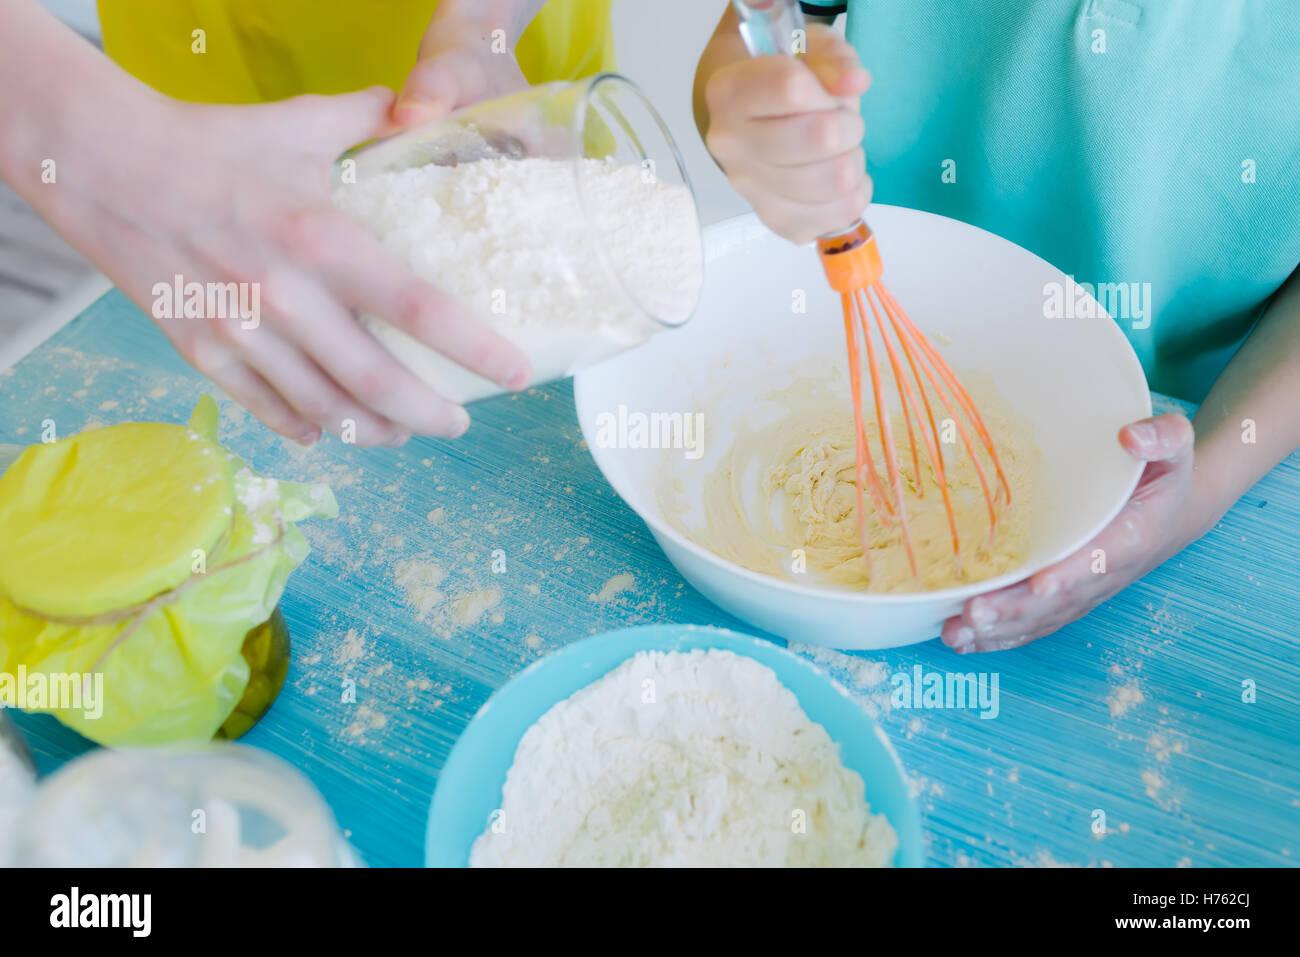 Kitchen Helper Stock Photos & Kitchen Helper Stock Images - Alamy